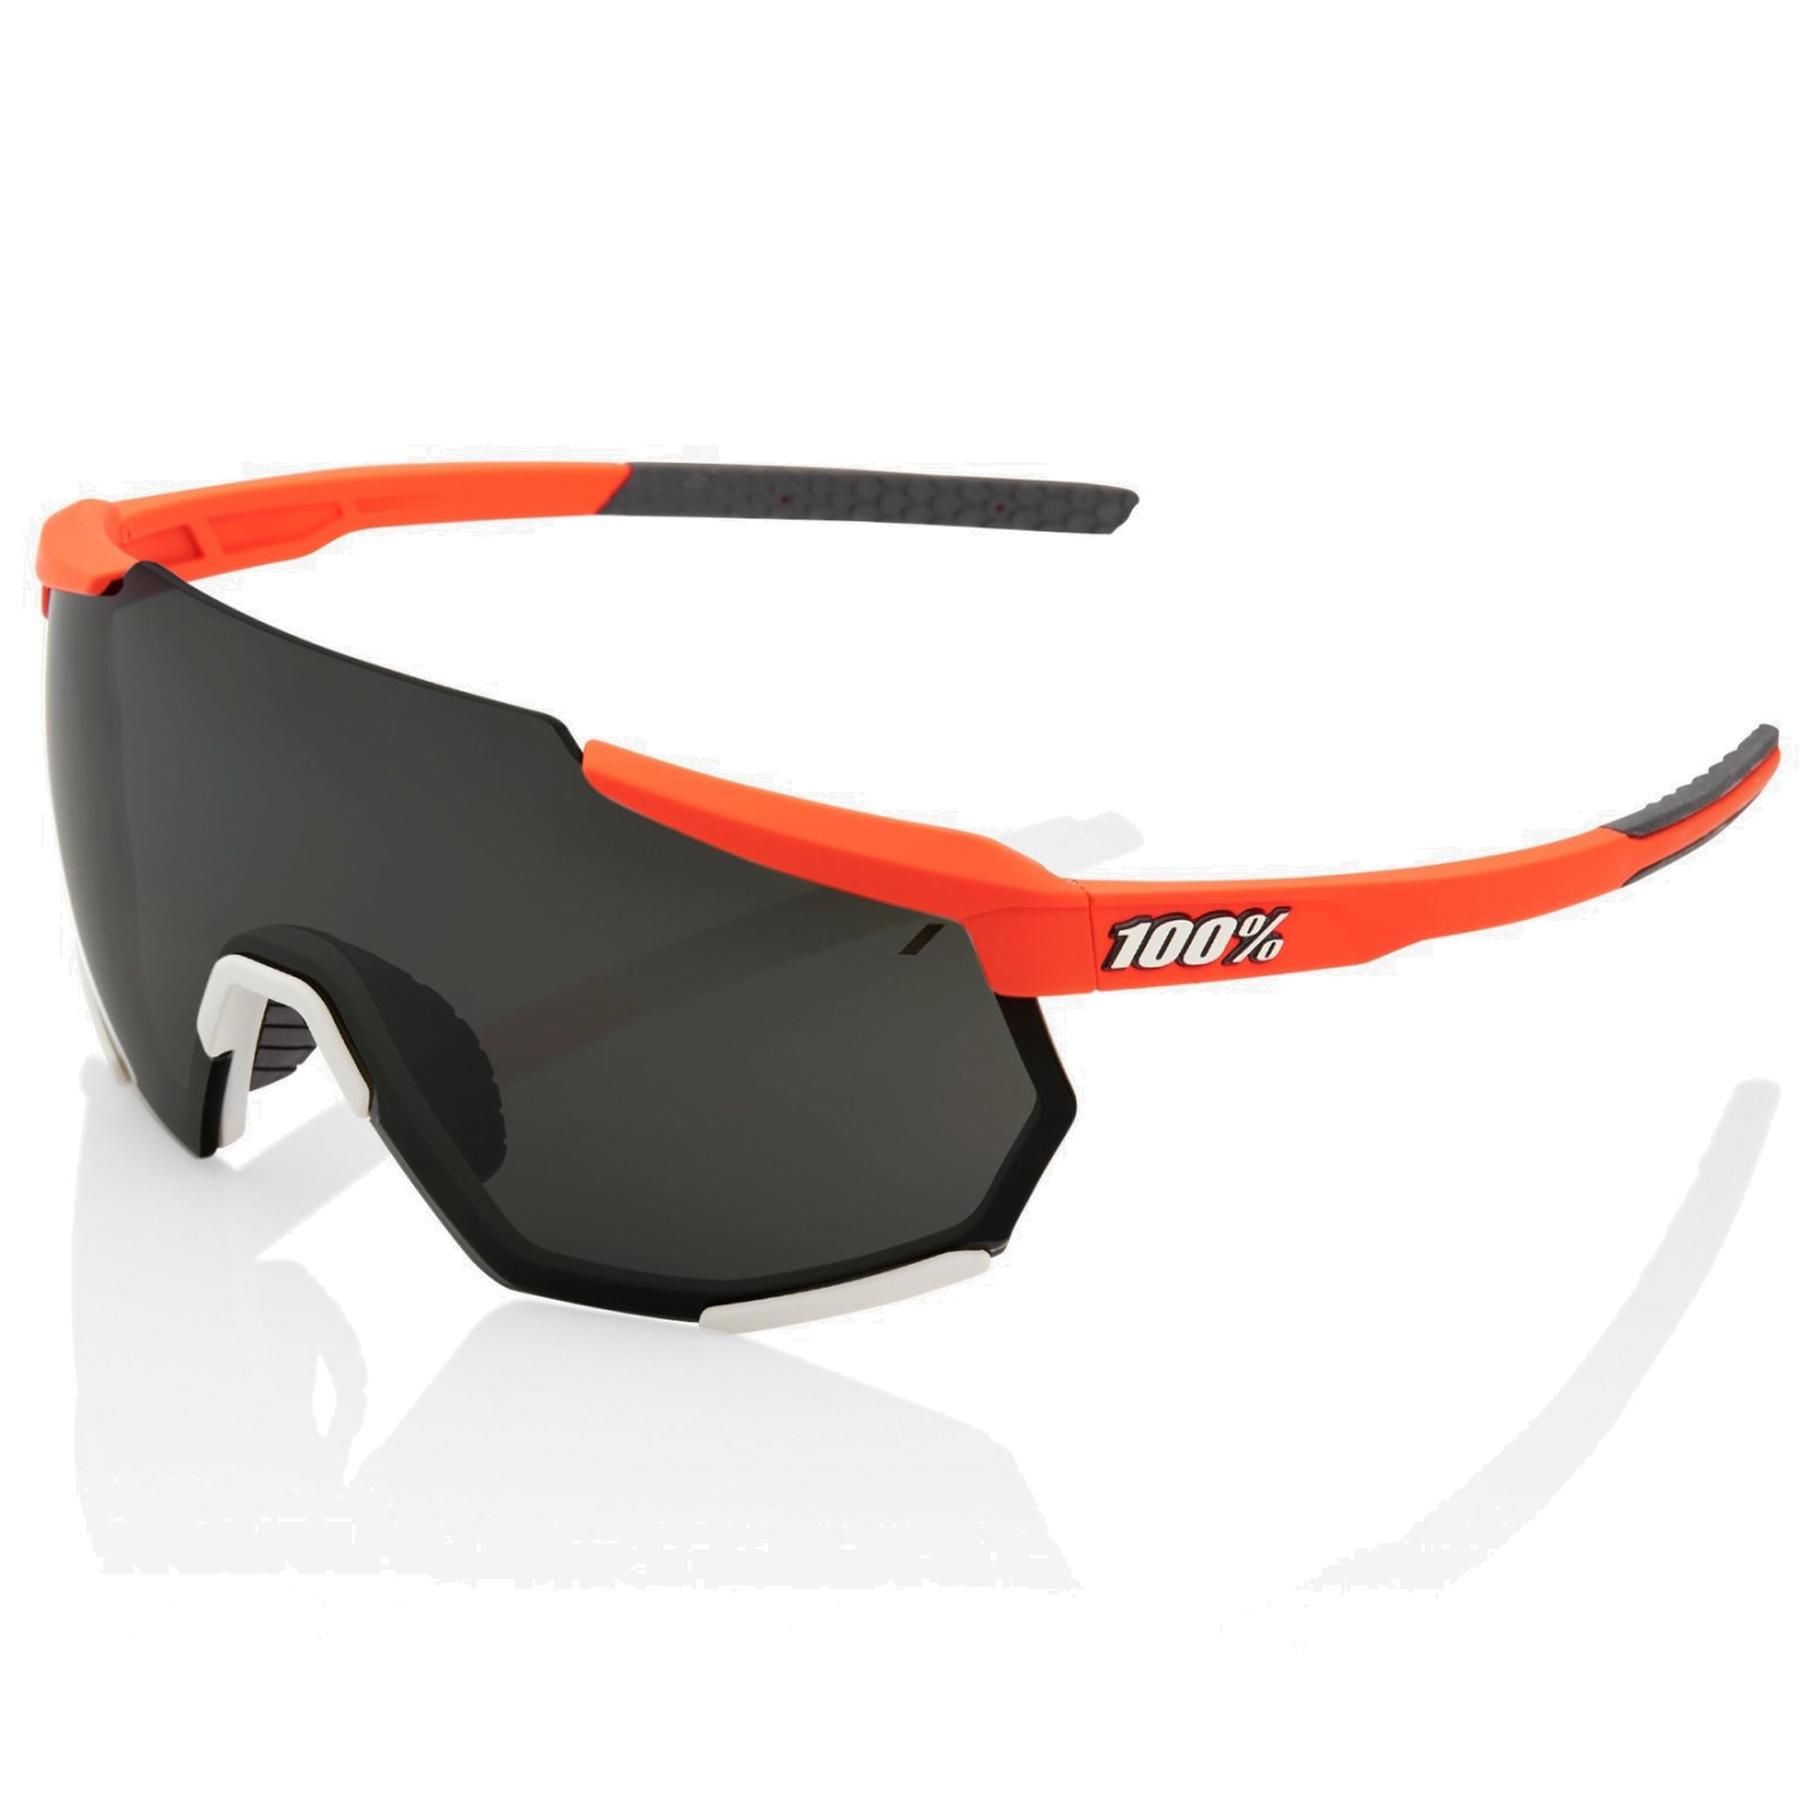 100% Racetrap Mirror Gafas - Soft Tact Oxyfire/Black + Clear